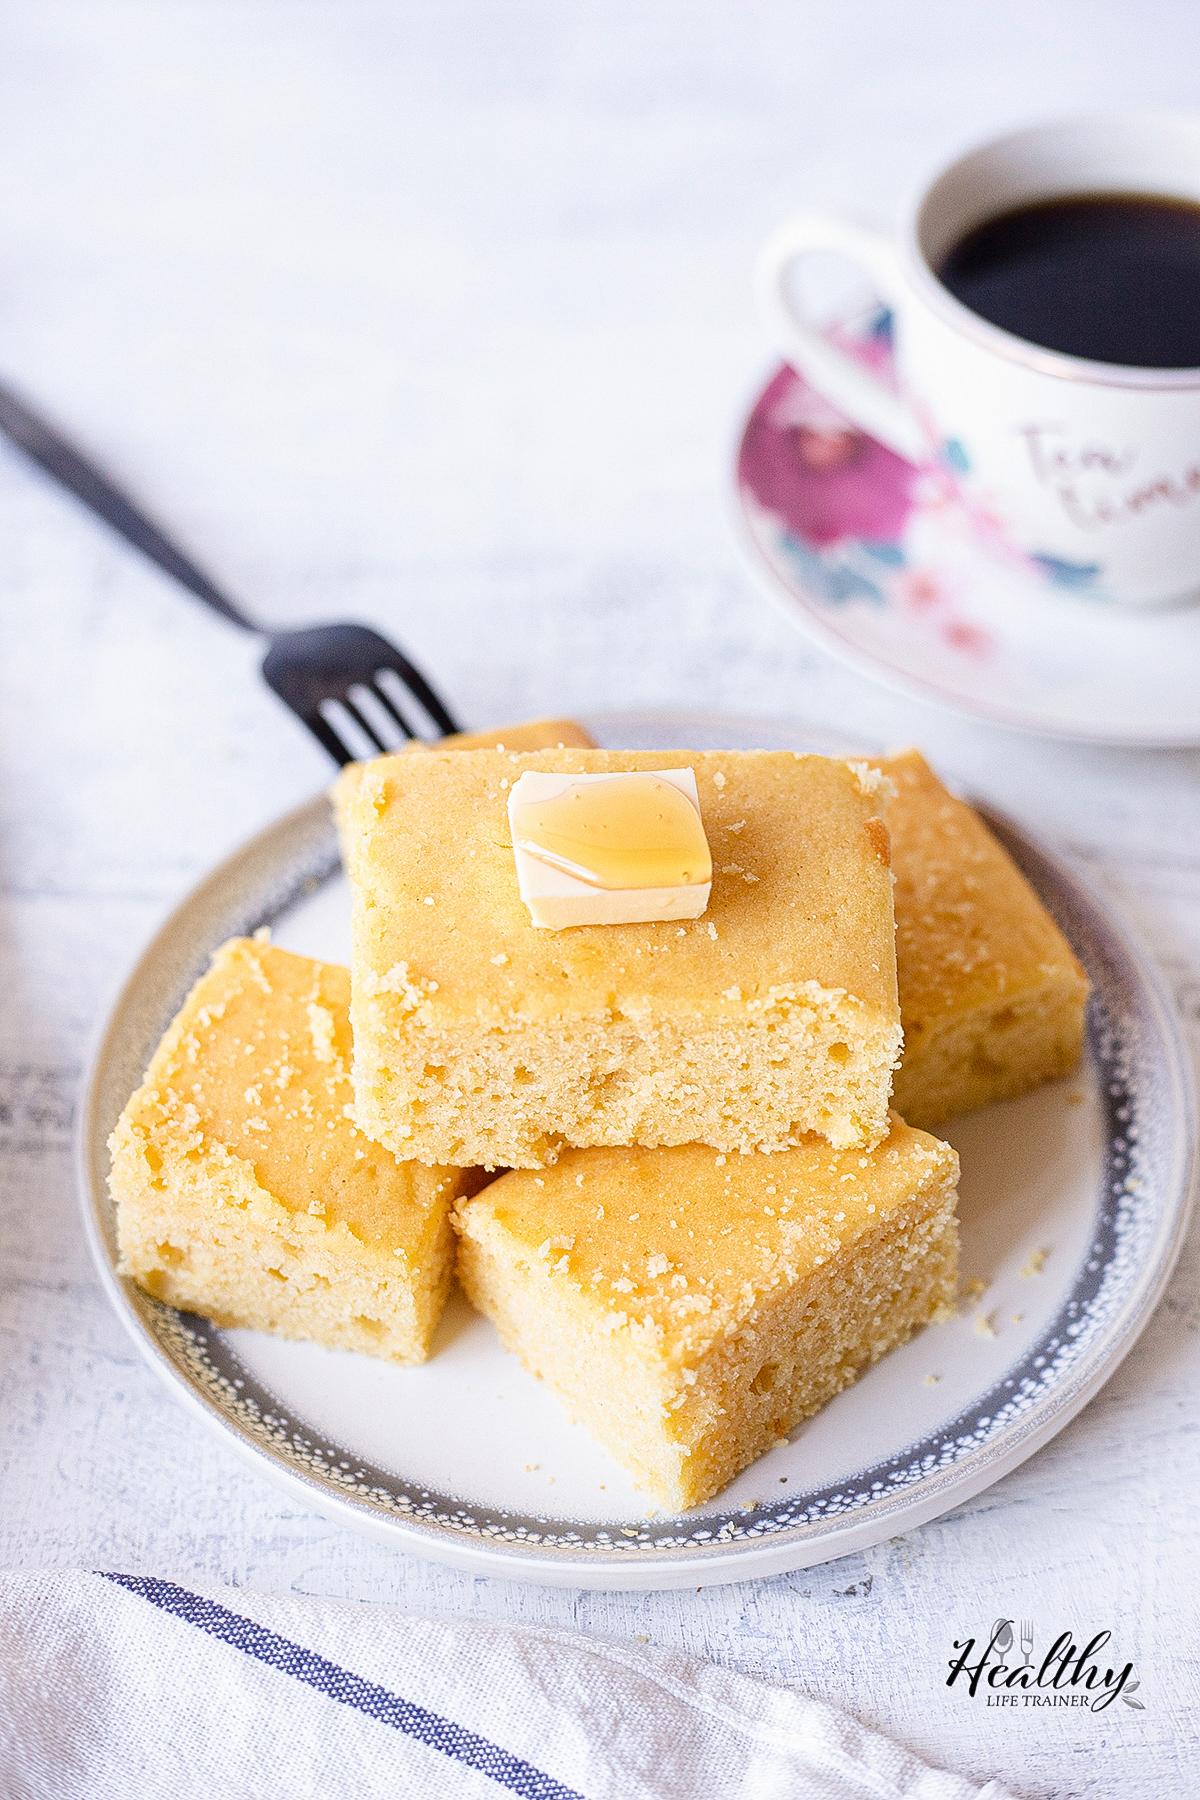 cornbread, honey and butter.